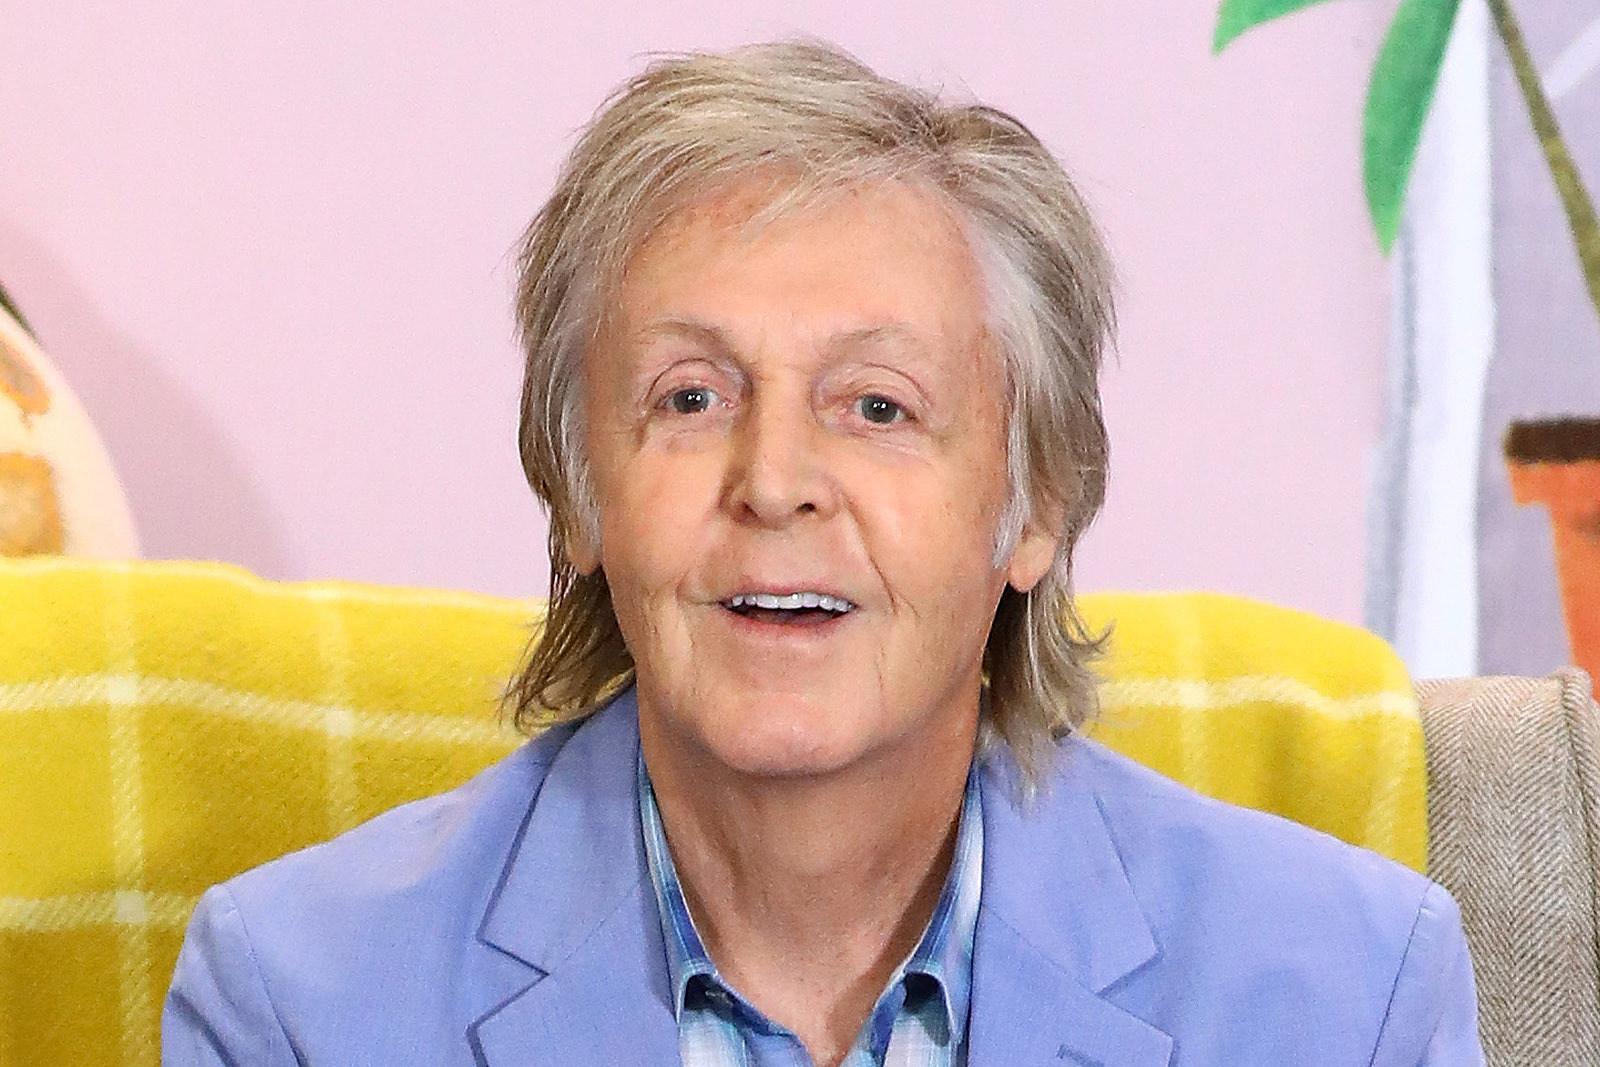 Paul McCartney's Secret to Saving His Eyesight